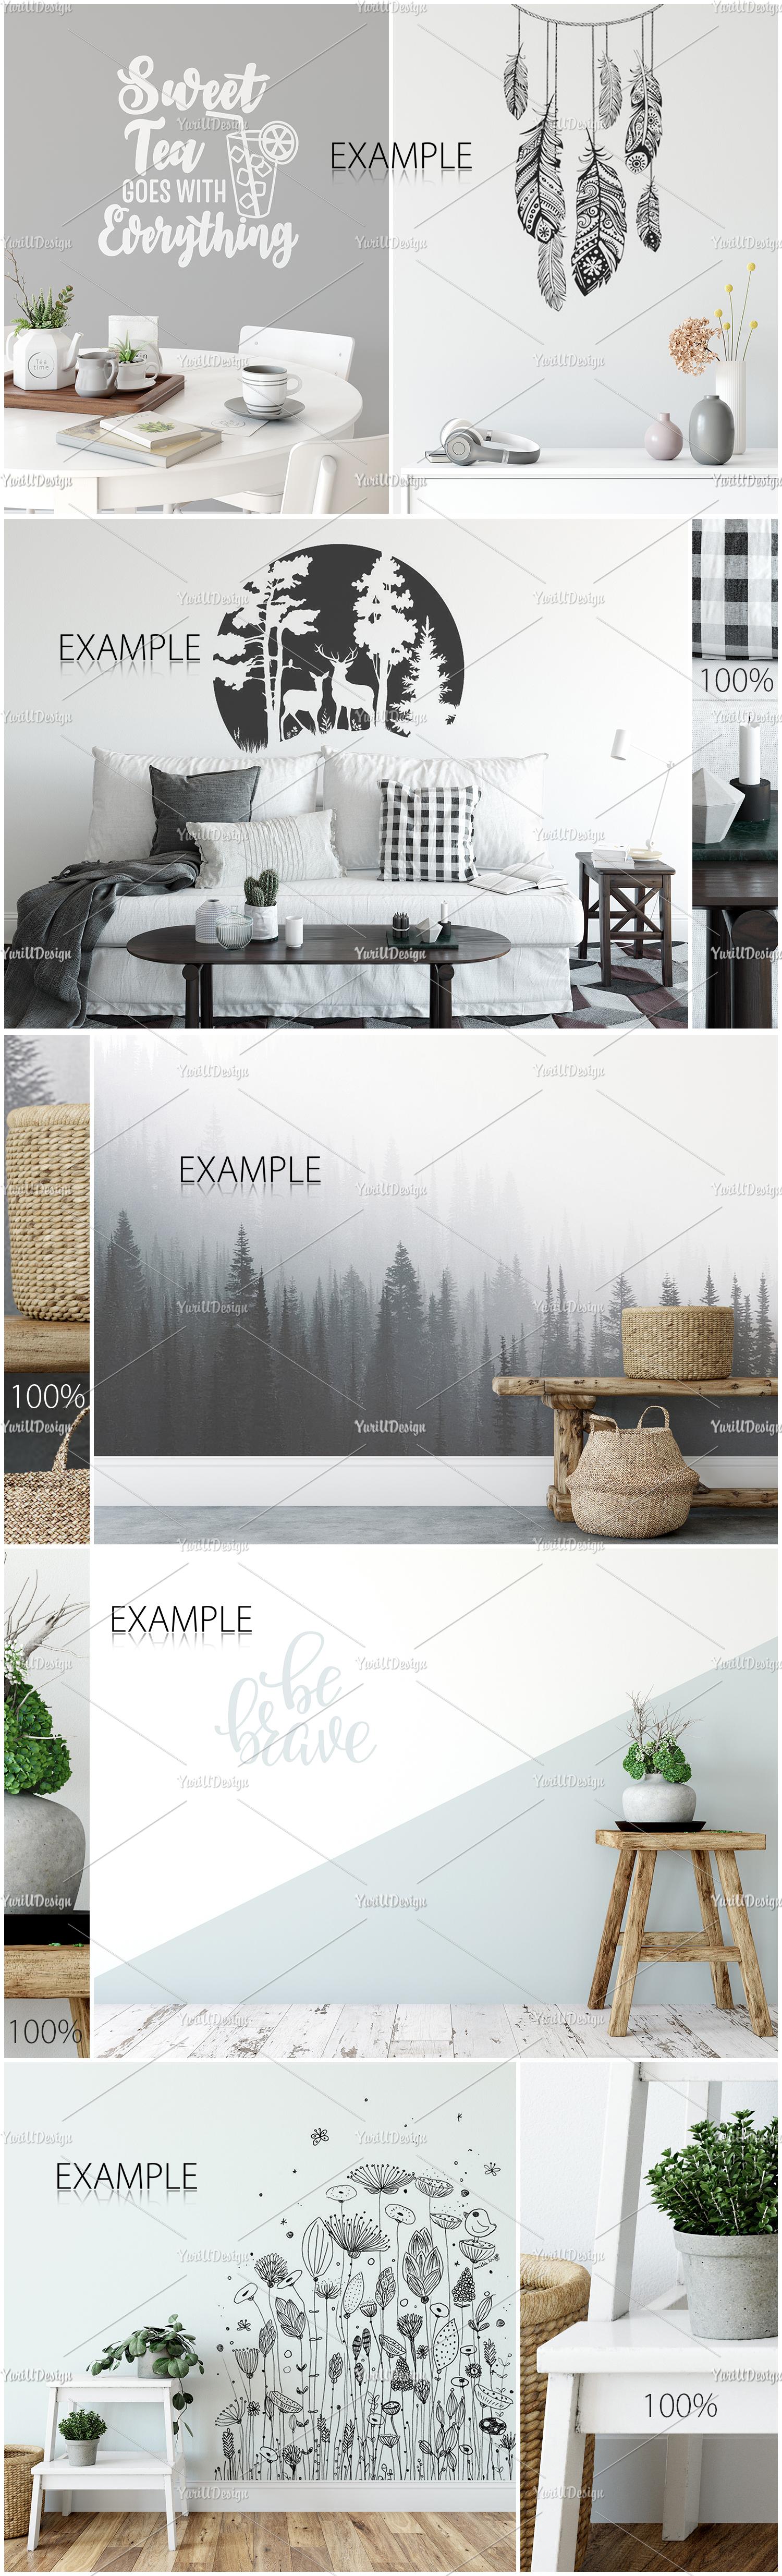 Scandinavian Interior Frames & Walls Mockup Bundle example image 10